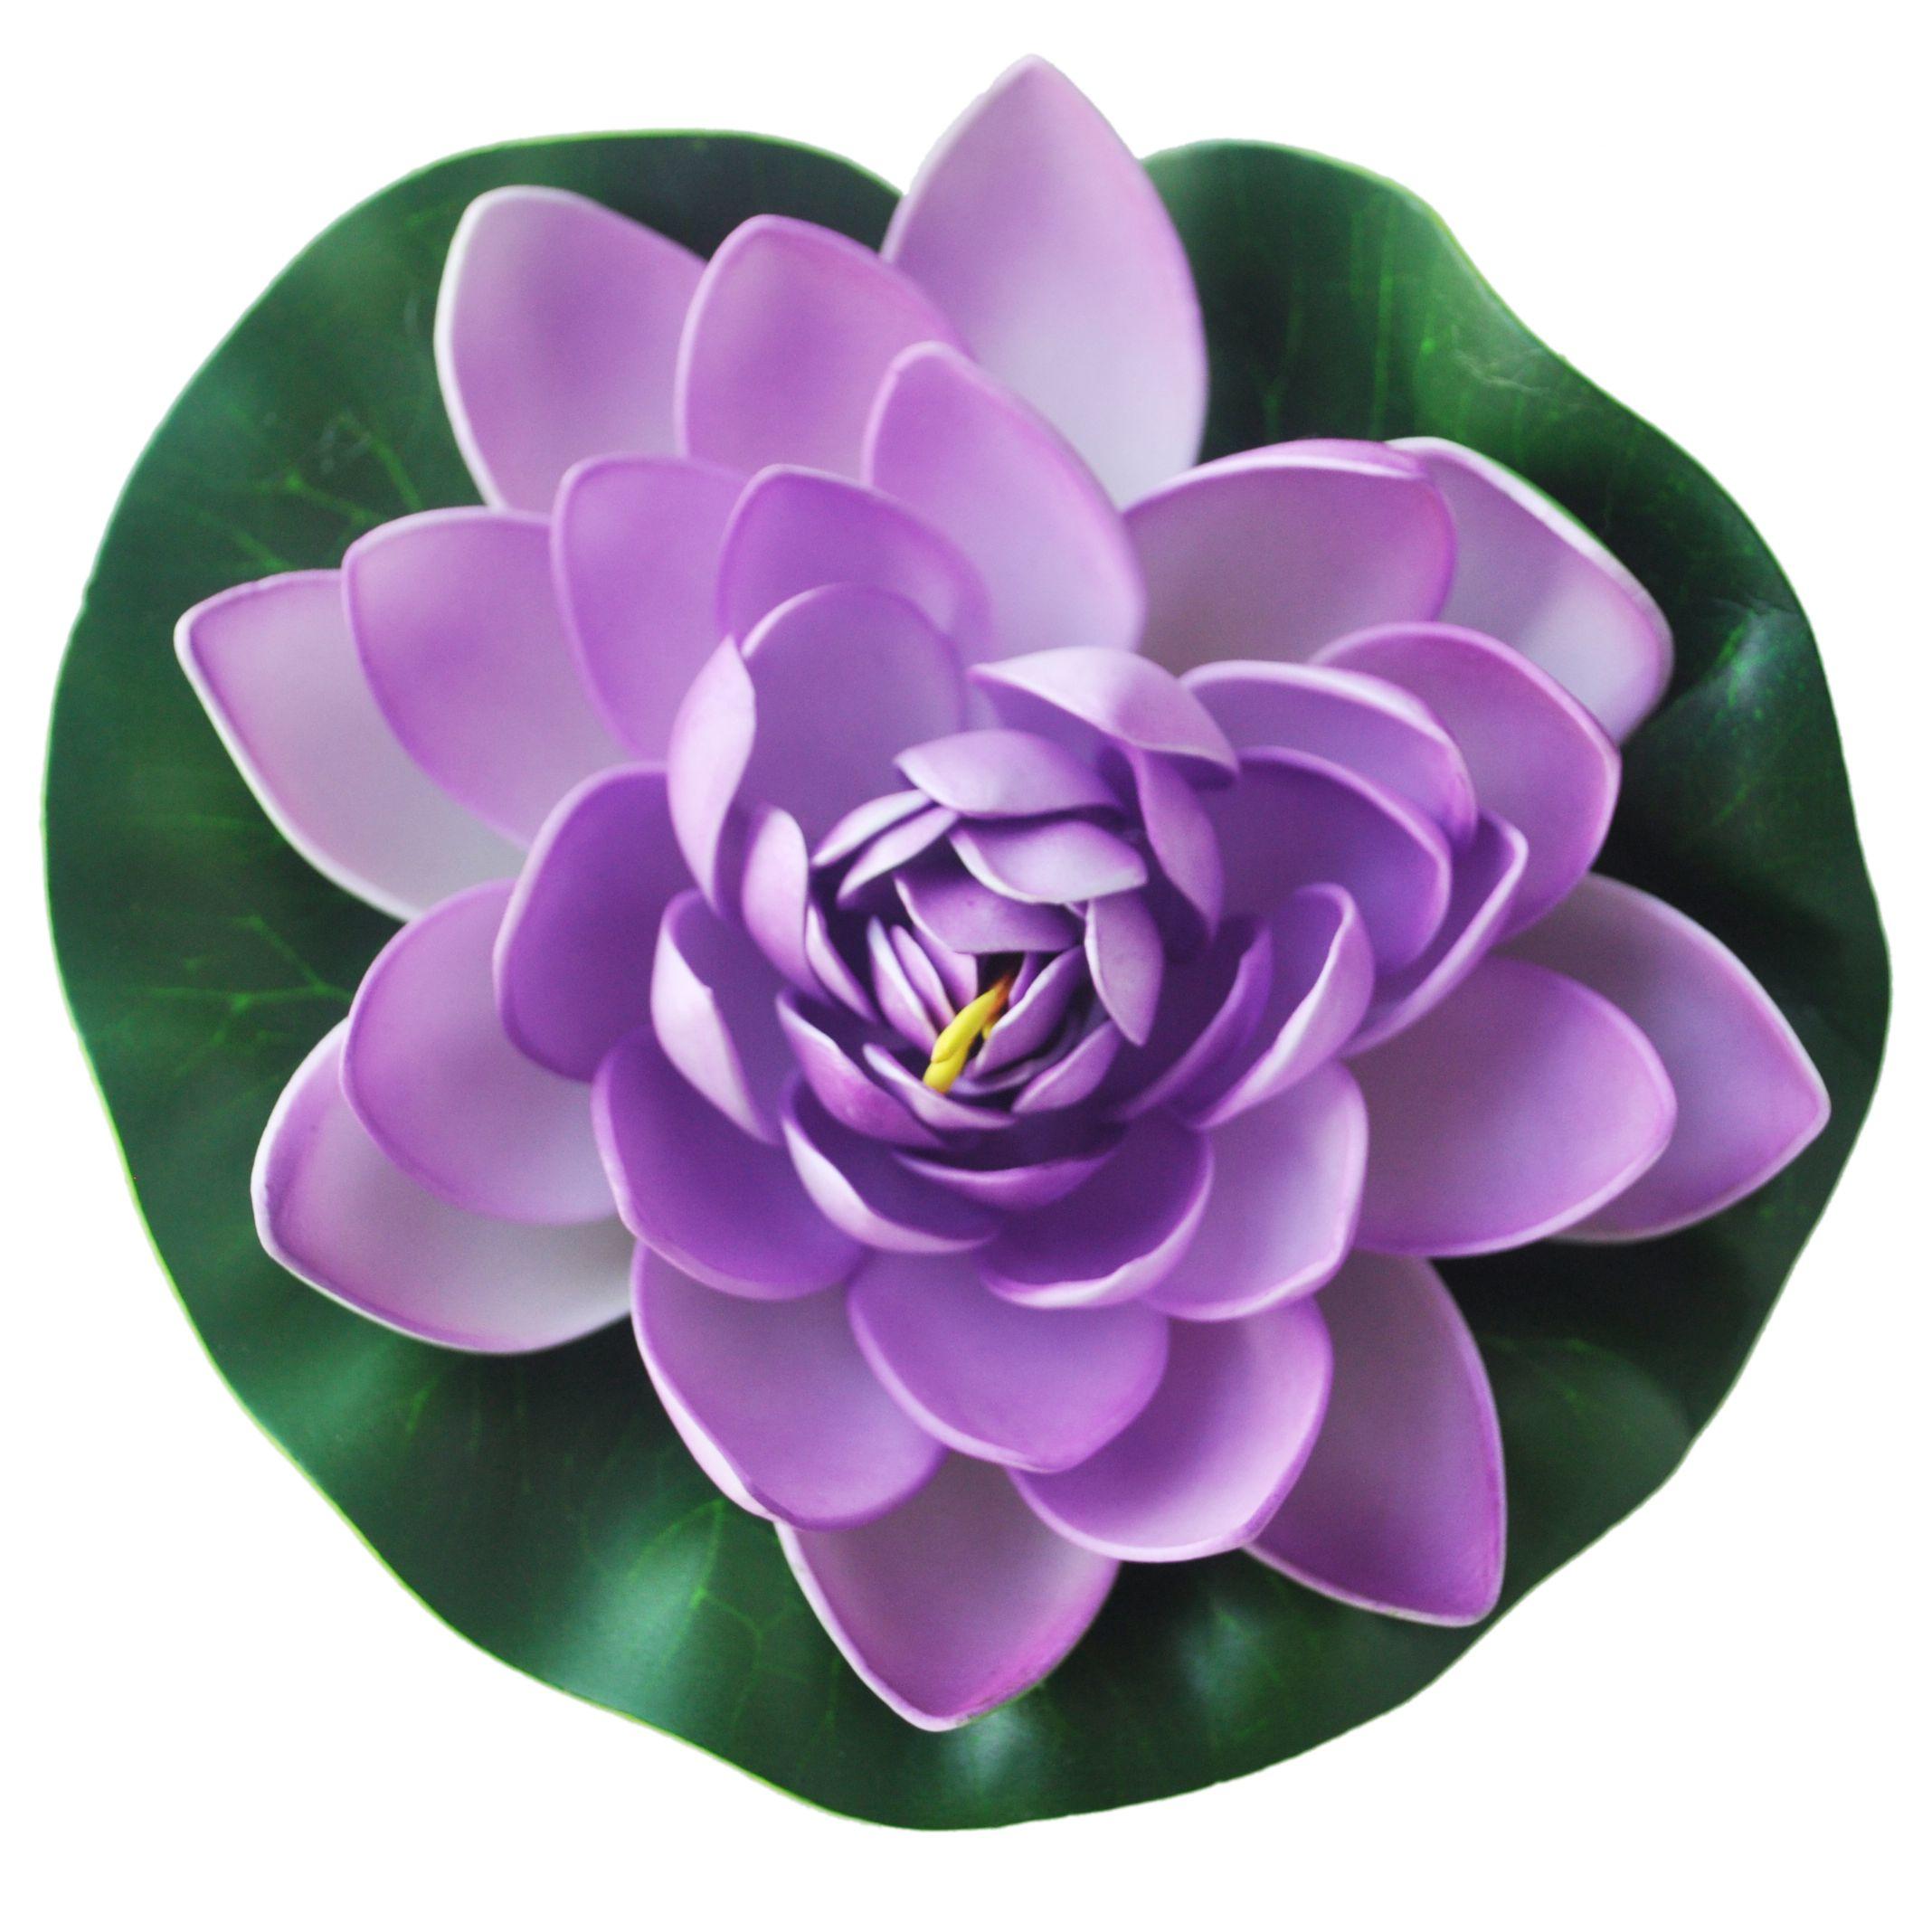 schwimmende lila lotus dekoration fuer aquarium. Black Bedroom Furniture Sets. Home Design Ideas